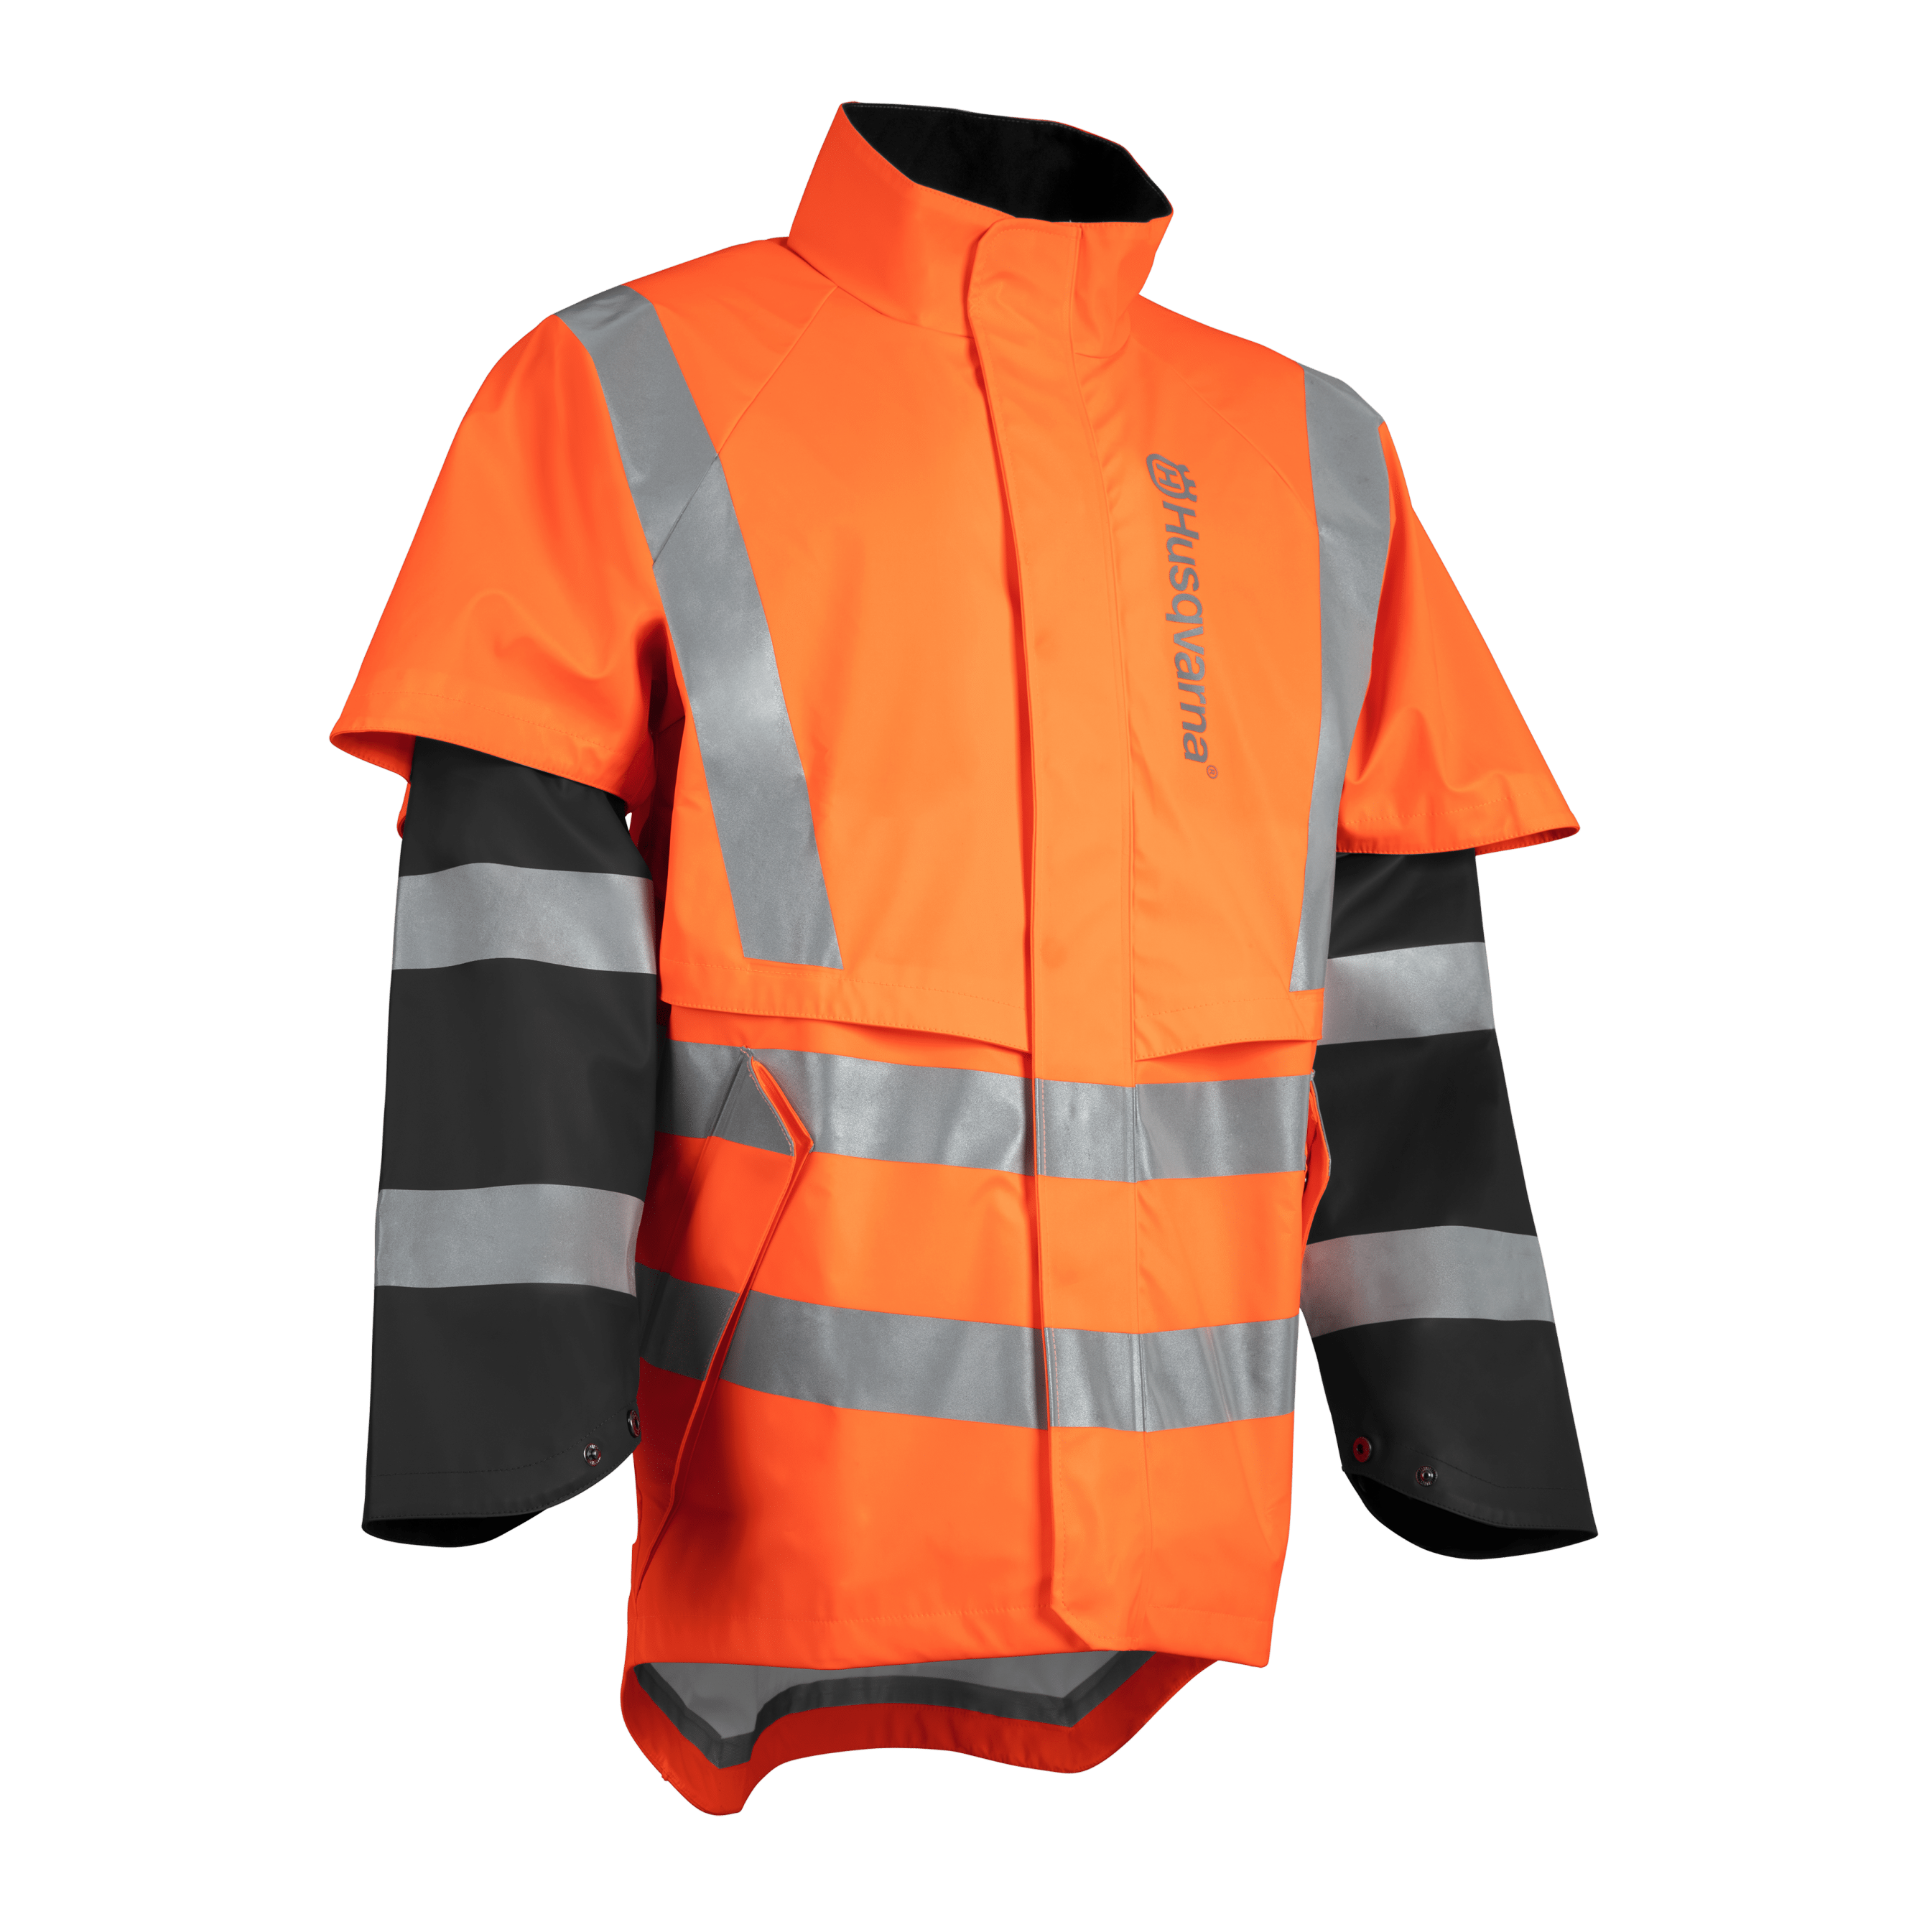 HUSQVARNA Rain Jacket Protect High-Viz, Functional - V-Pro Power Equipment